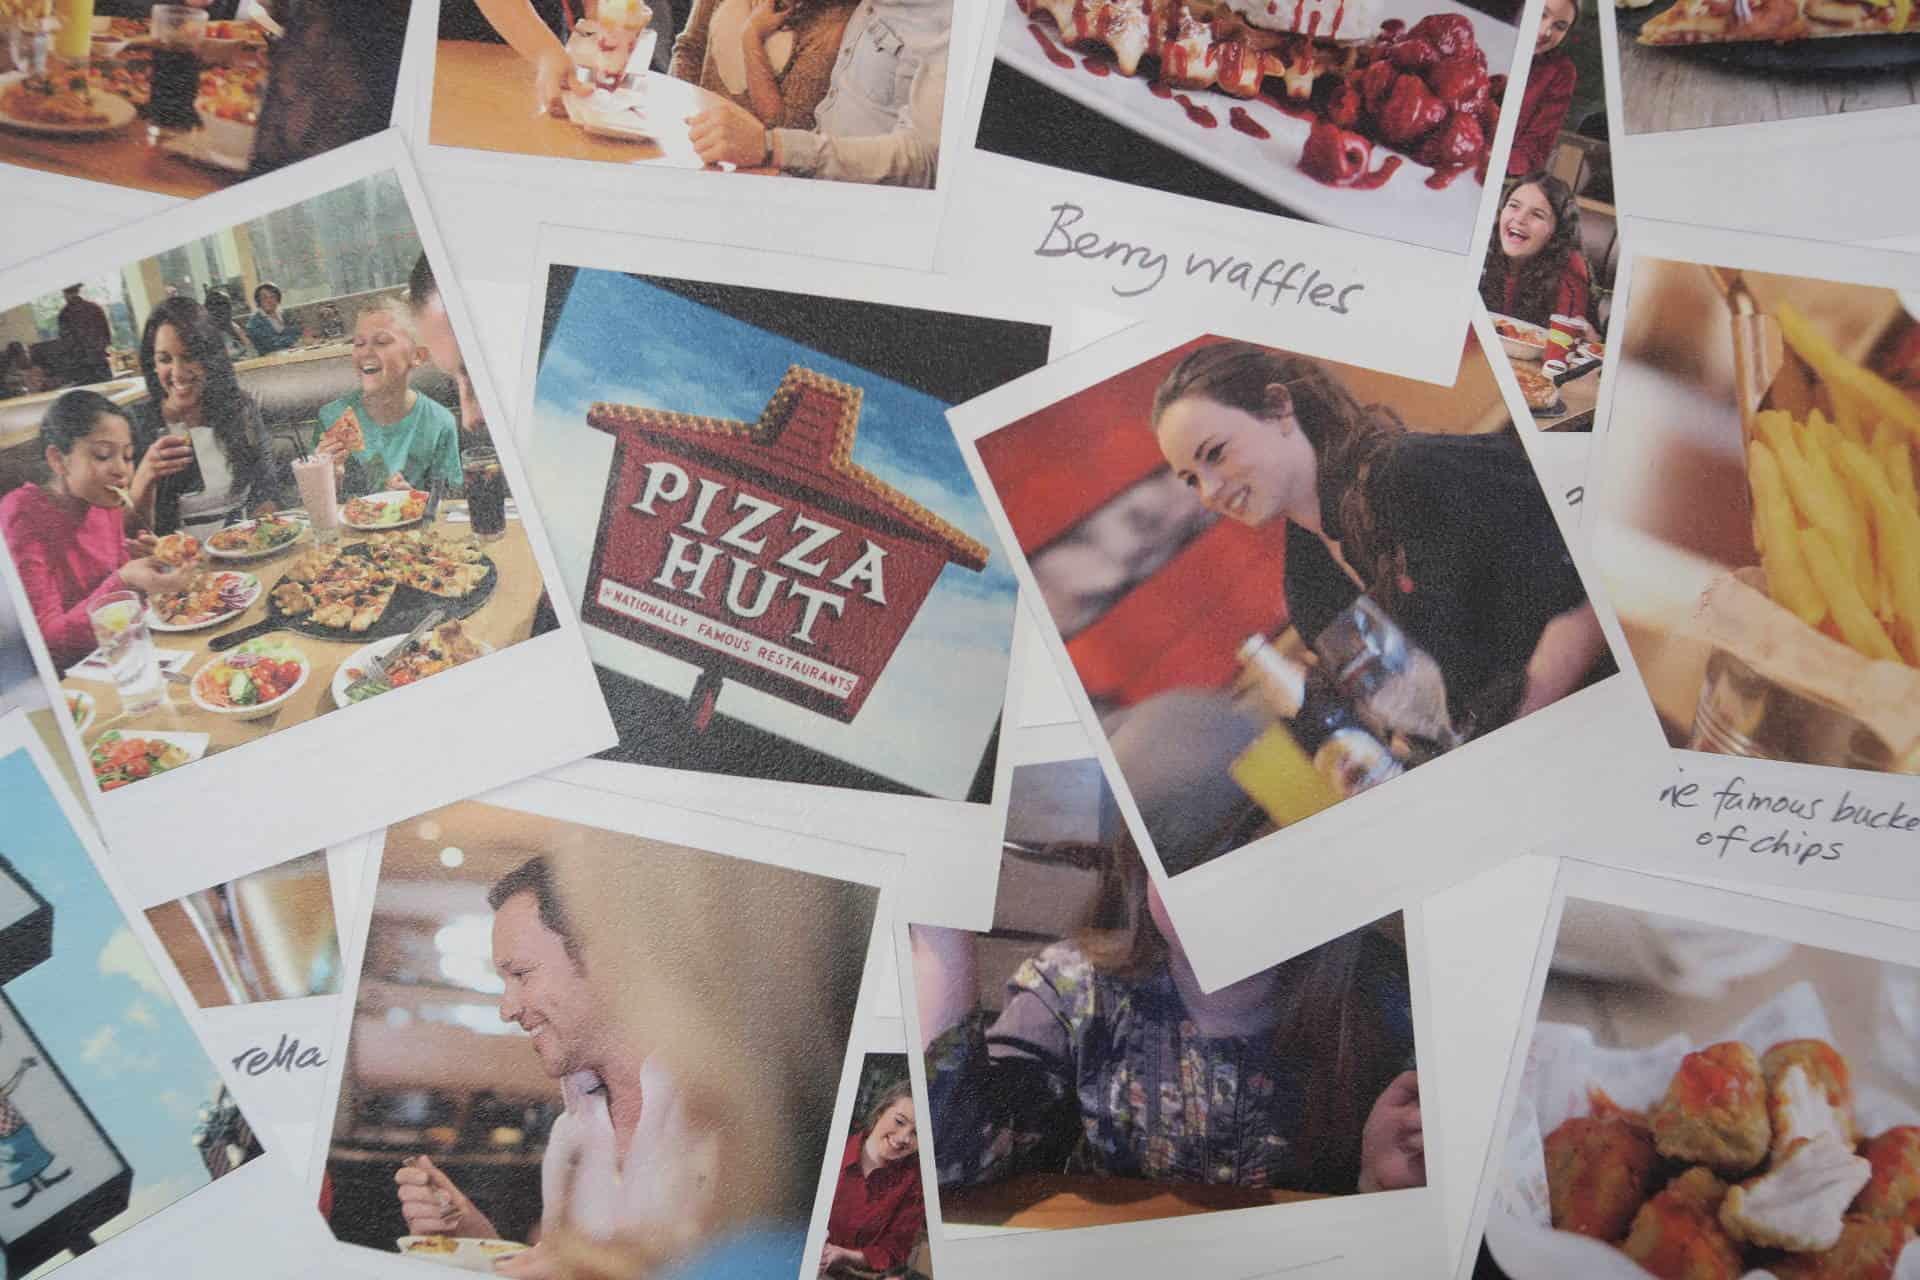 gluten-free-pizza-hut